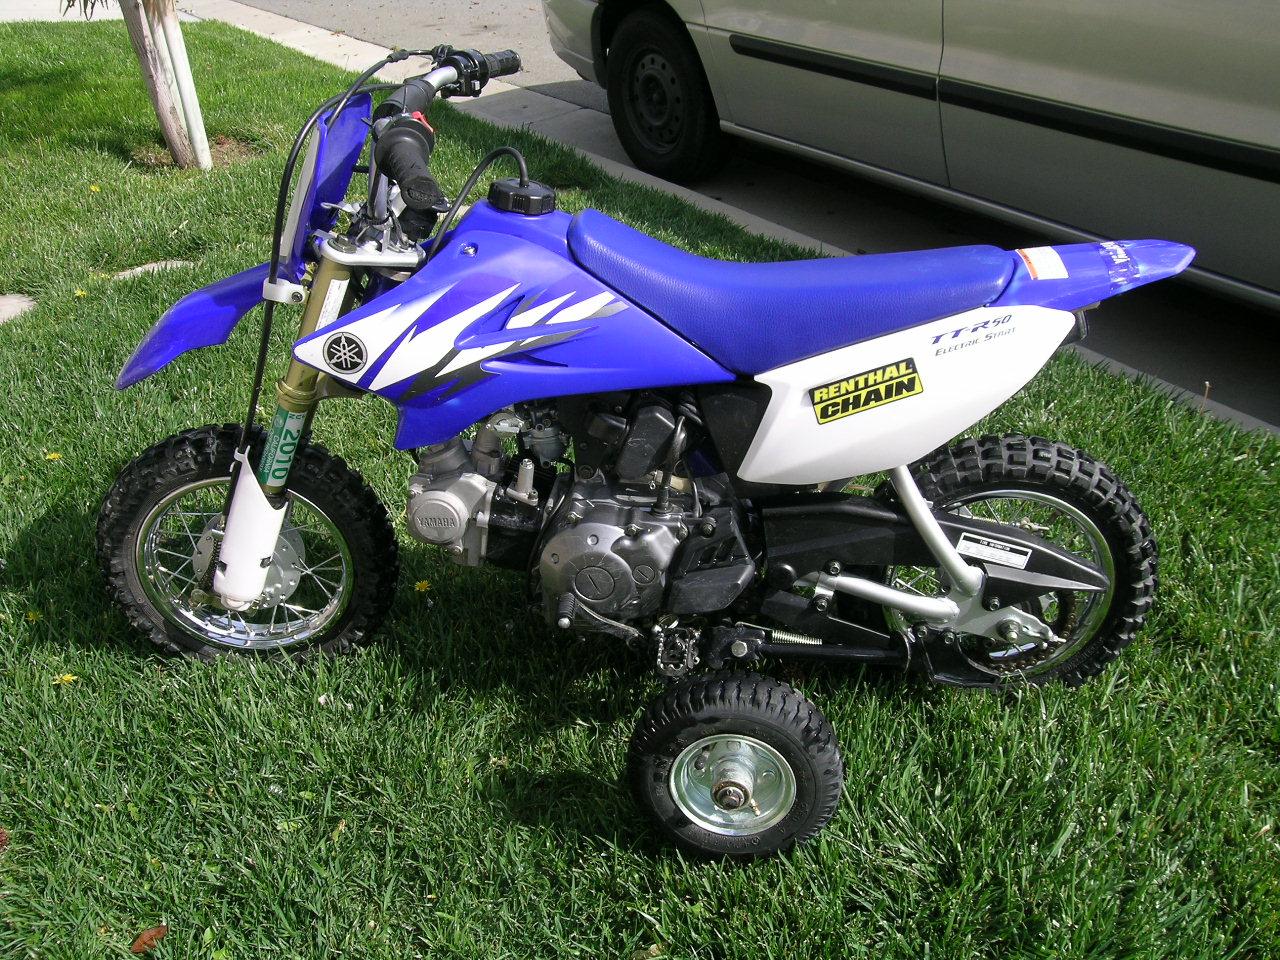 Yamaha TTR50 2006 Owner's manual